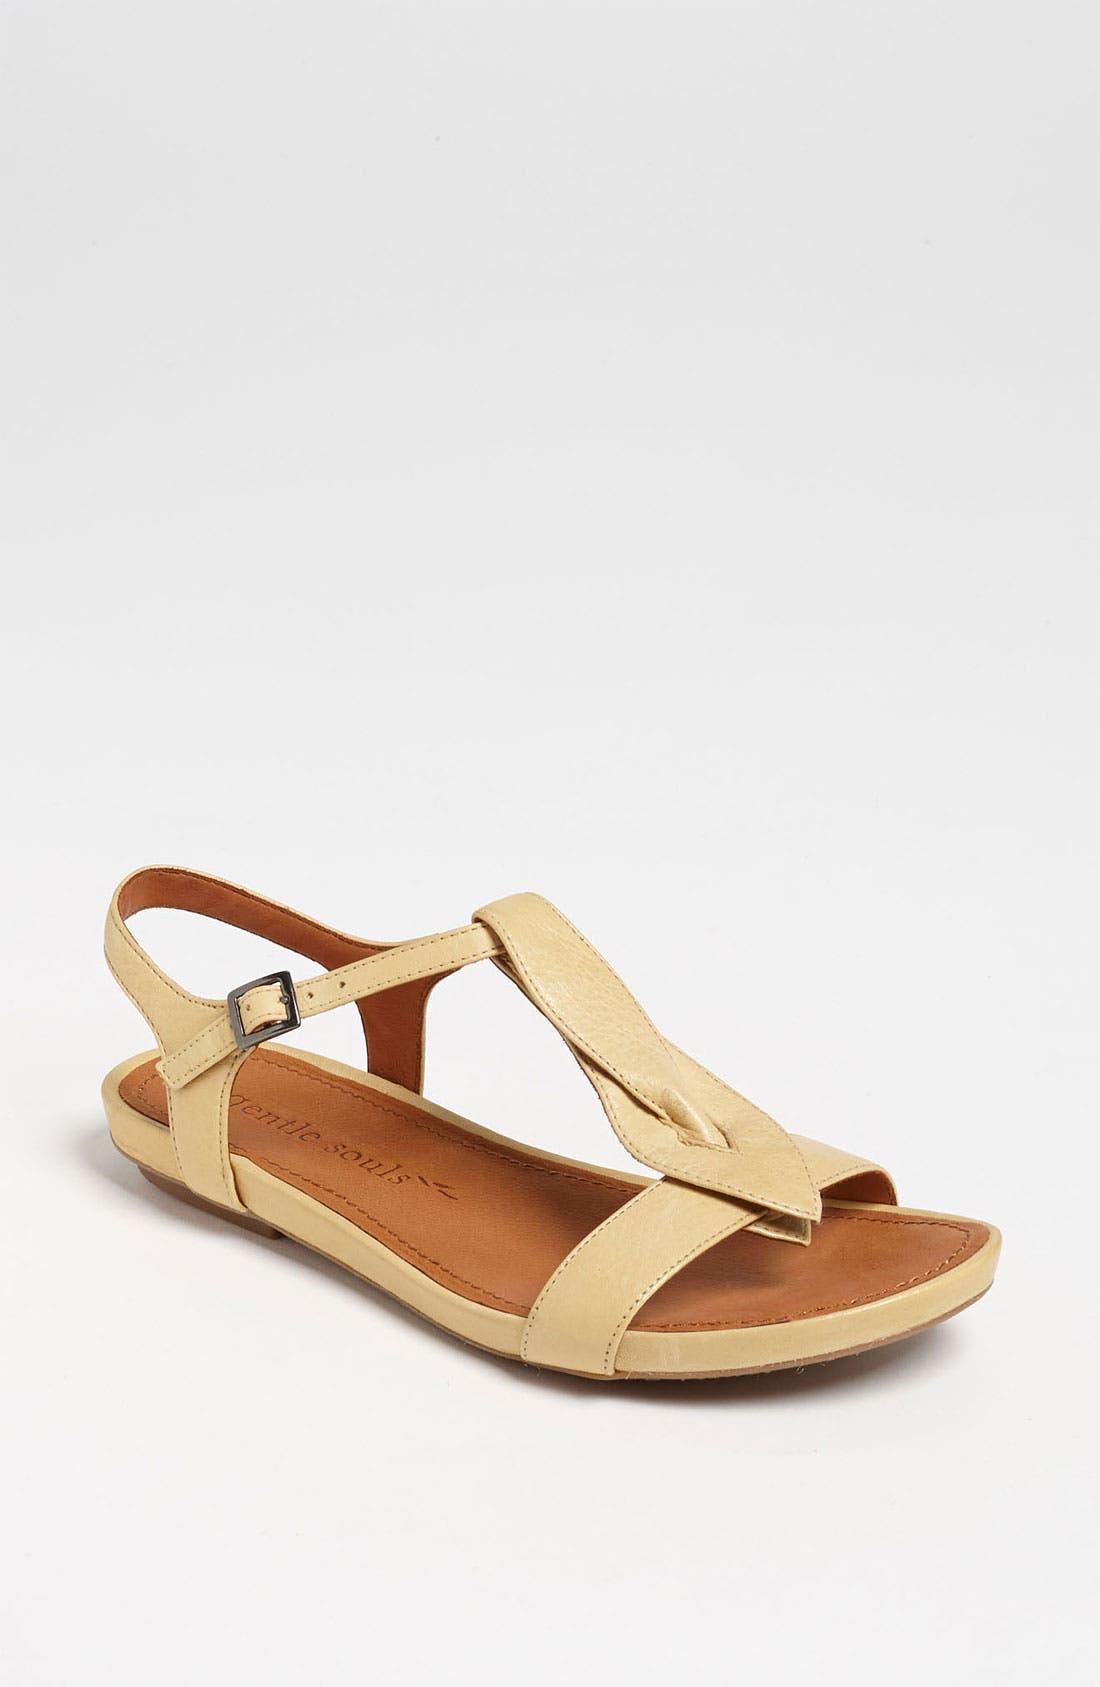 Main Image - Gentle Souls 'Bless Pine' Sandal